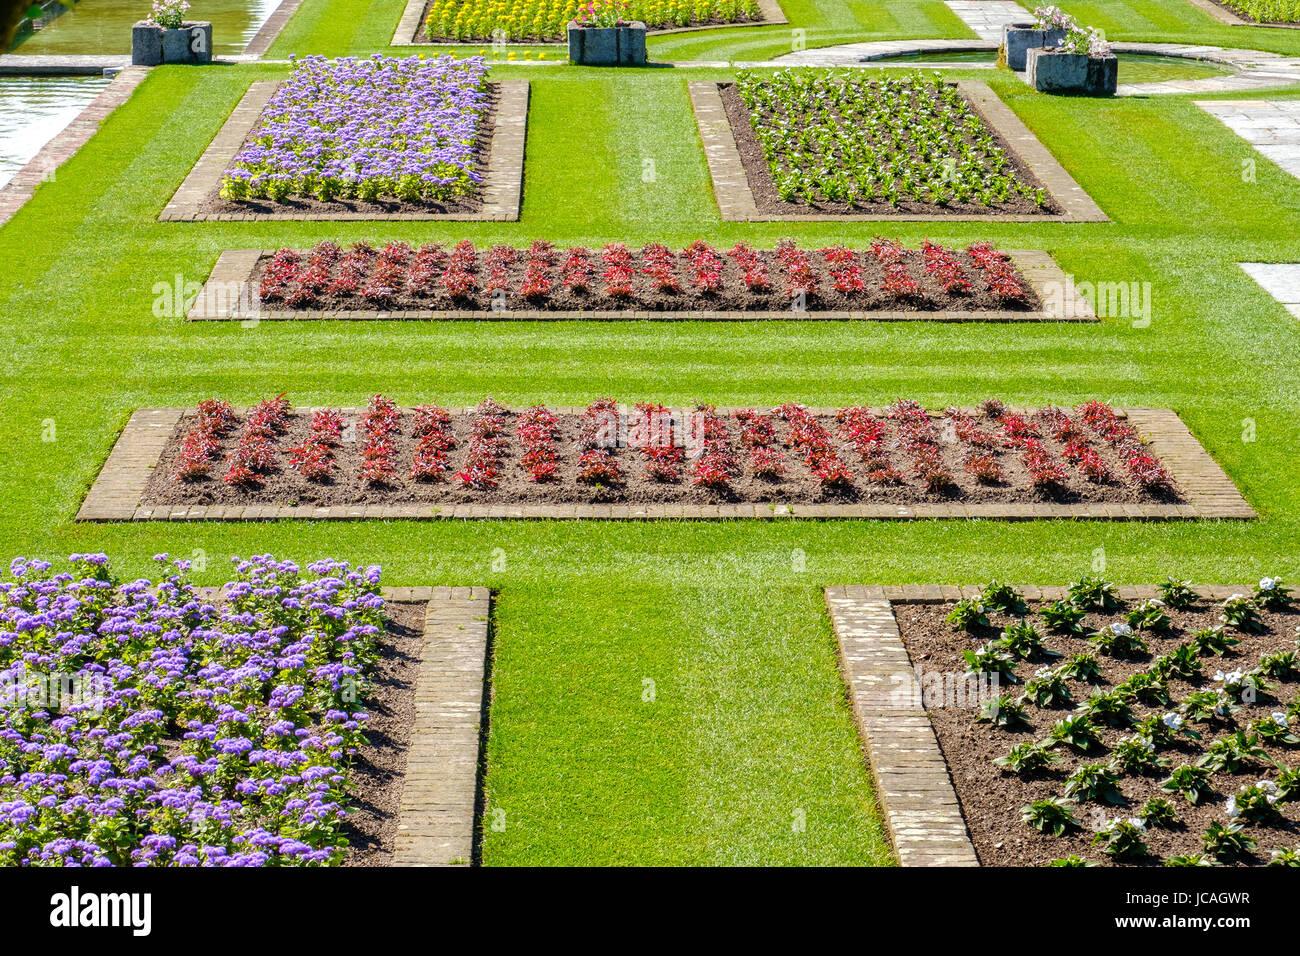 Idées jardins italiens parterres vue ci-dessus Photo Stock